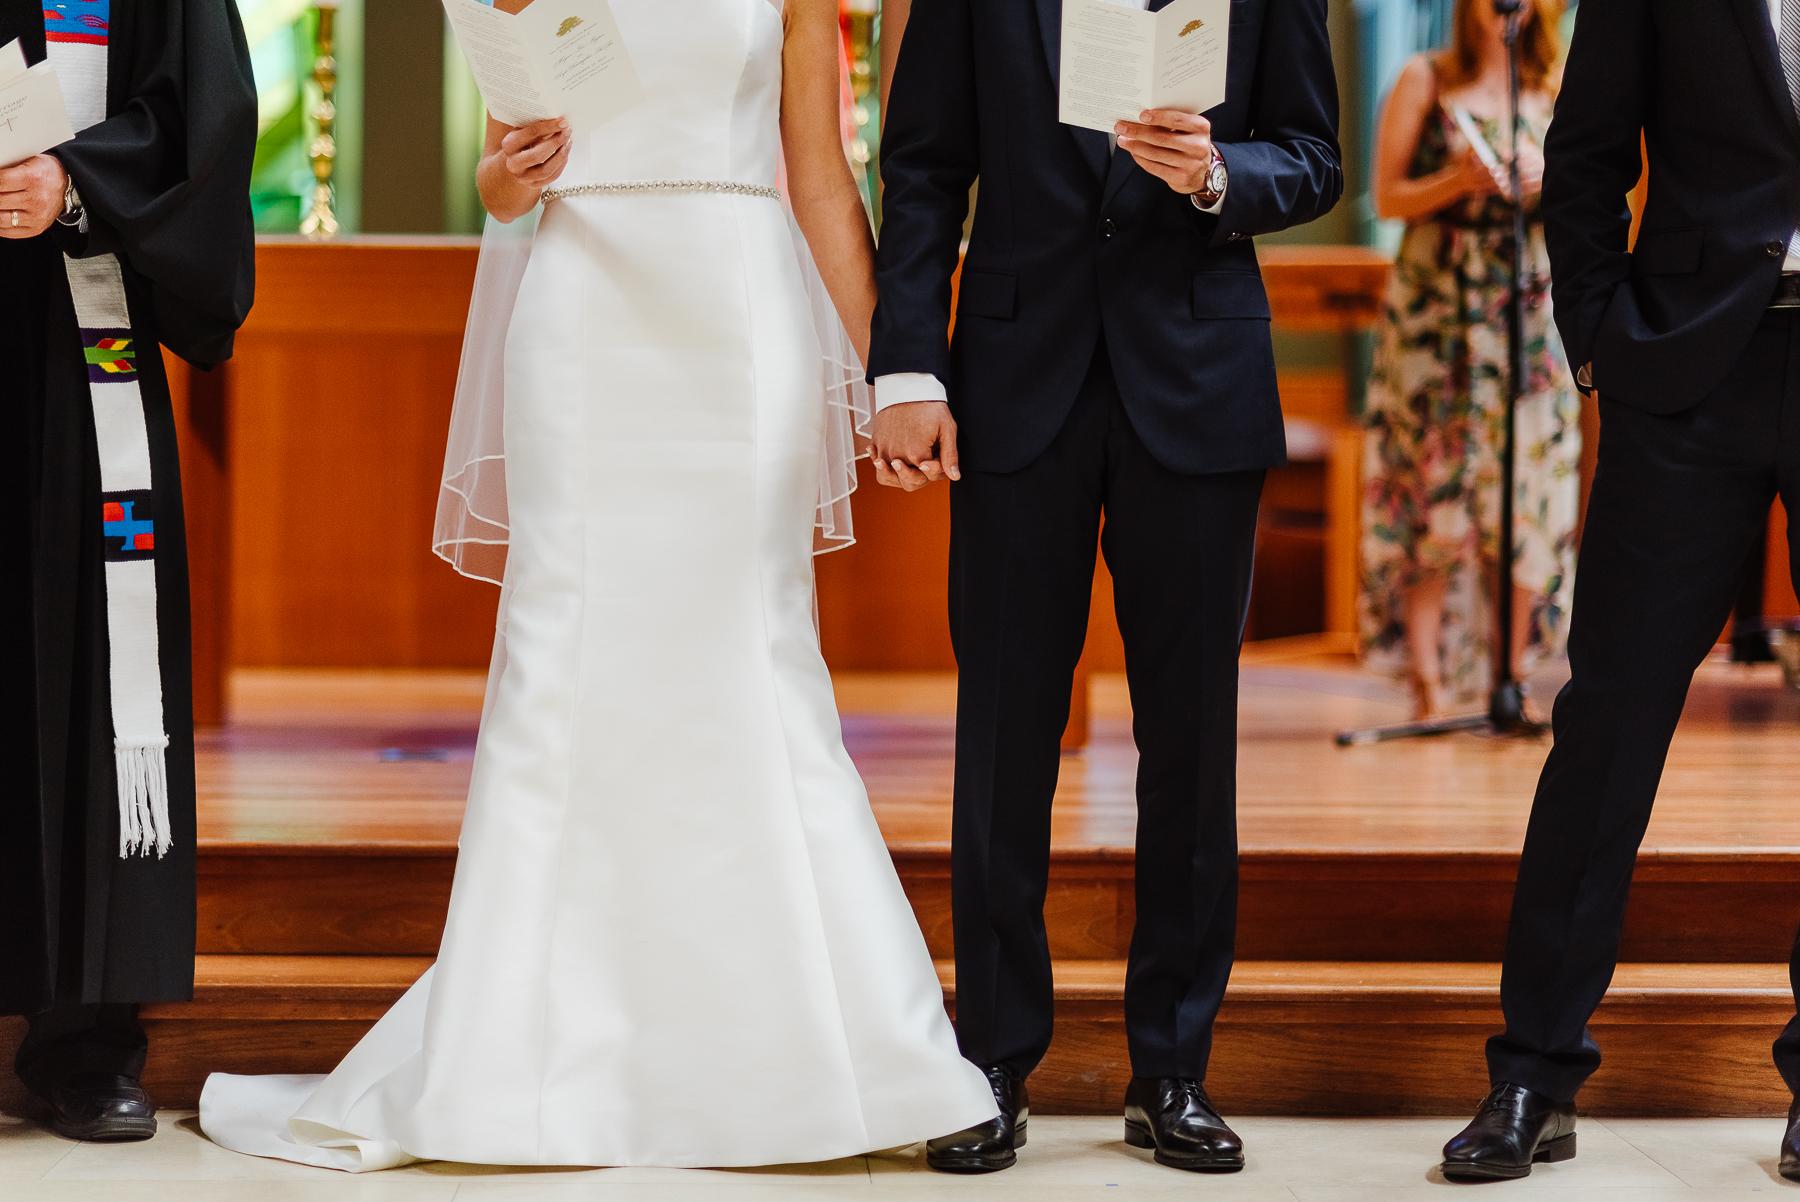 44-J Crew Wedding New Jersey Wedding Photographer J Crew Weddings.jpg